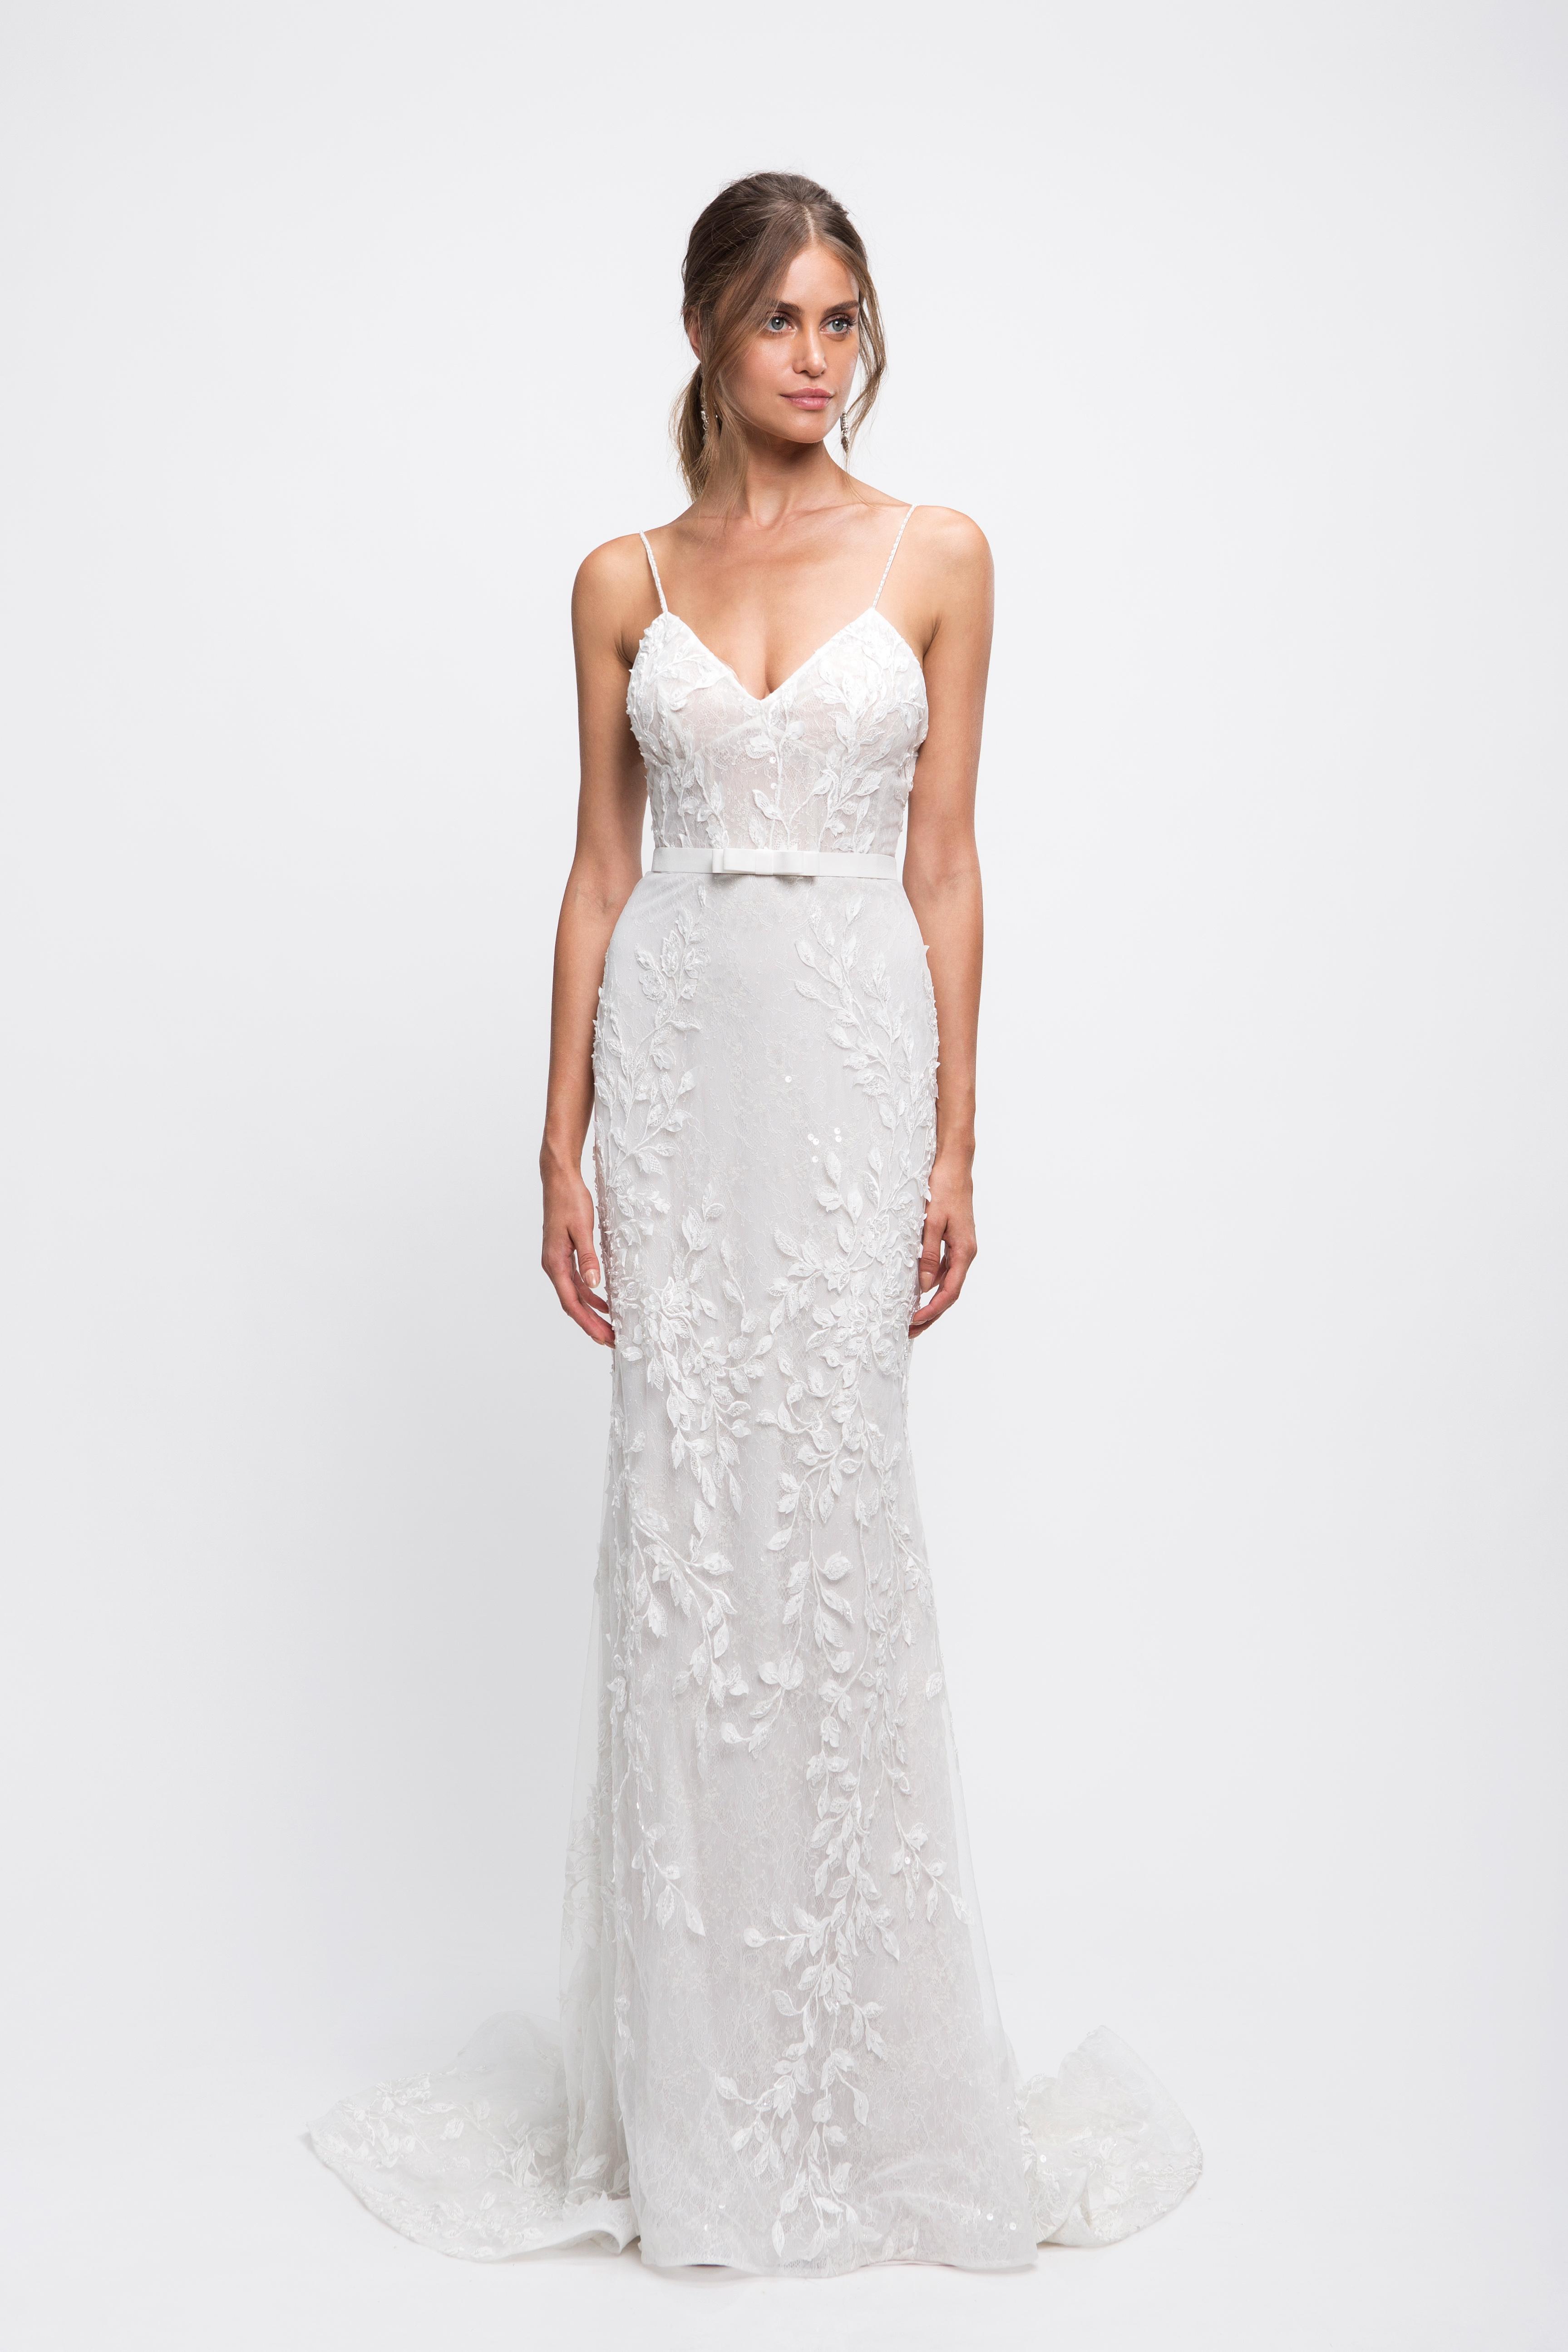 lihi hod wedding dress lace spaghetti strap sweetheart trumpet